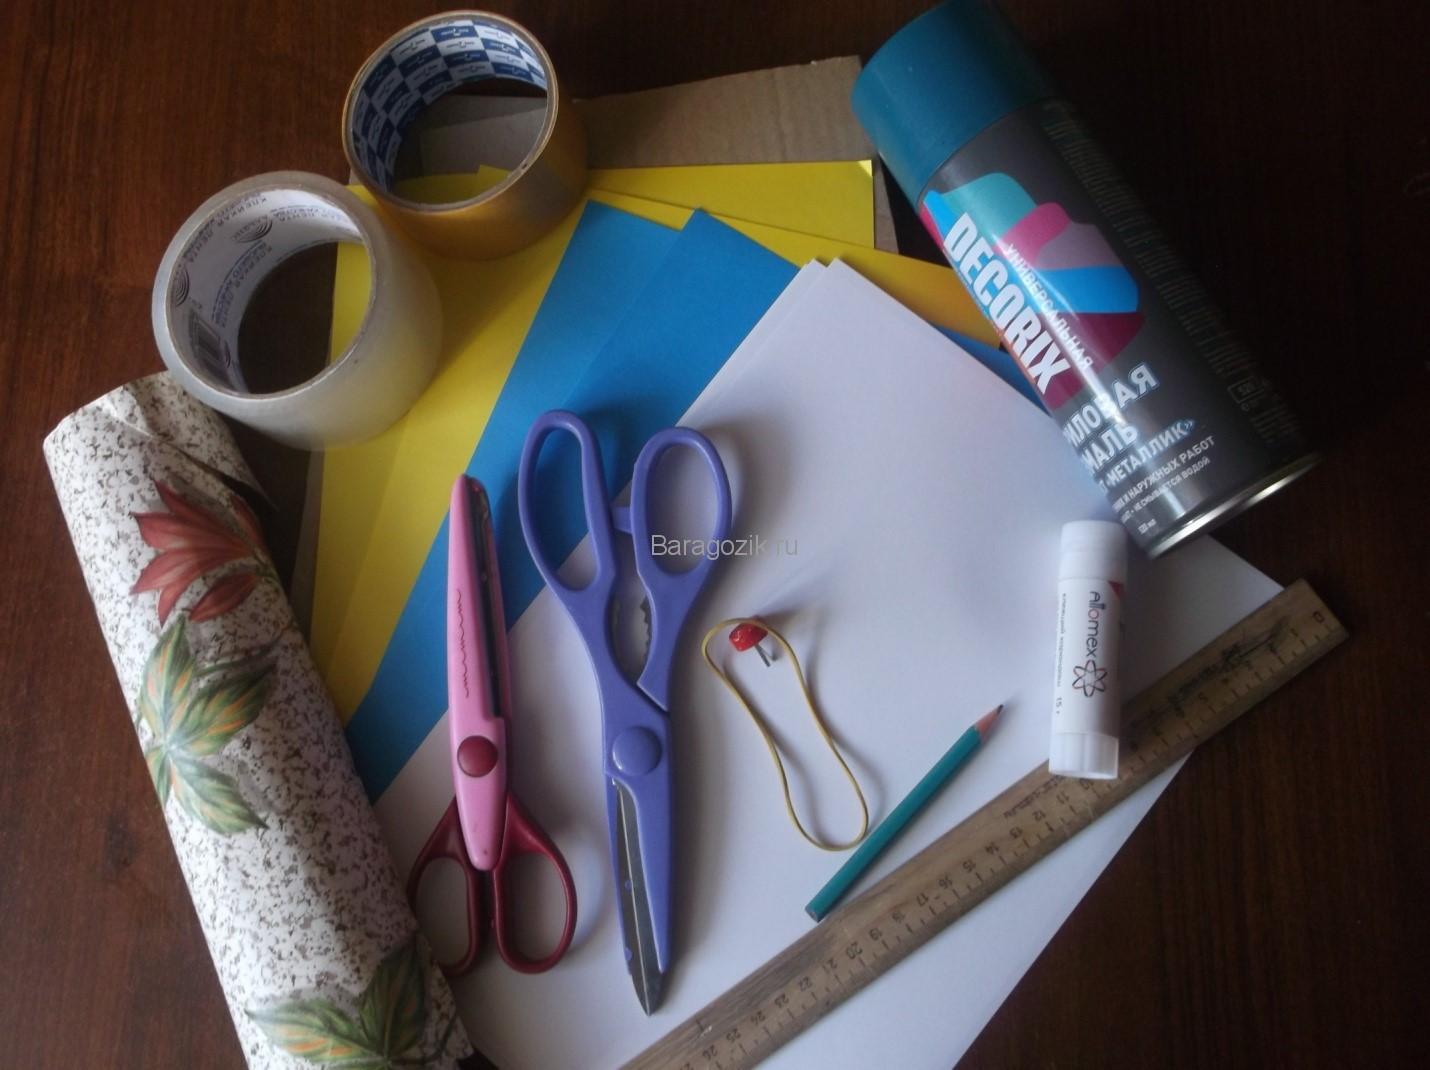 papka-dlya-tetradej-svoimi-rukami-v-podarok-shkolniku-1 Как сделать папку для тетрадей своими руками в подарок школьнику